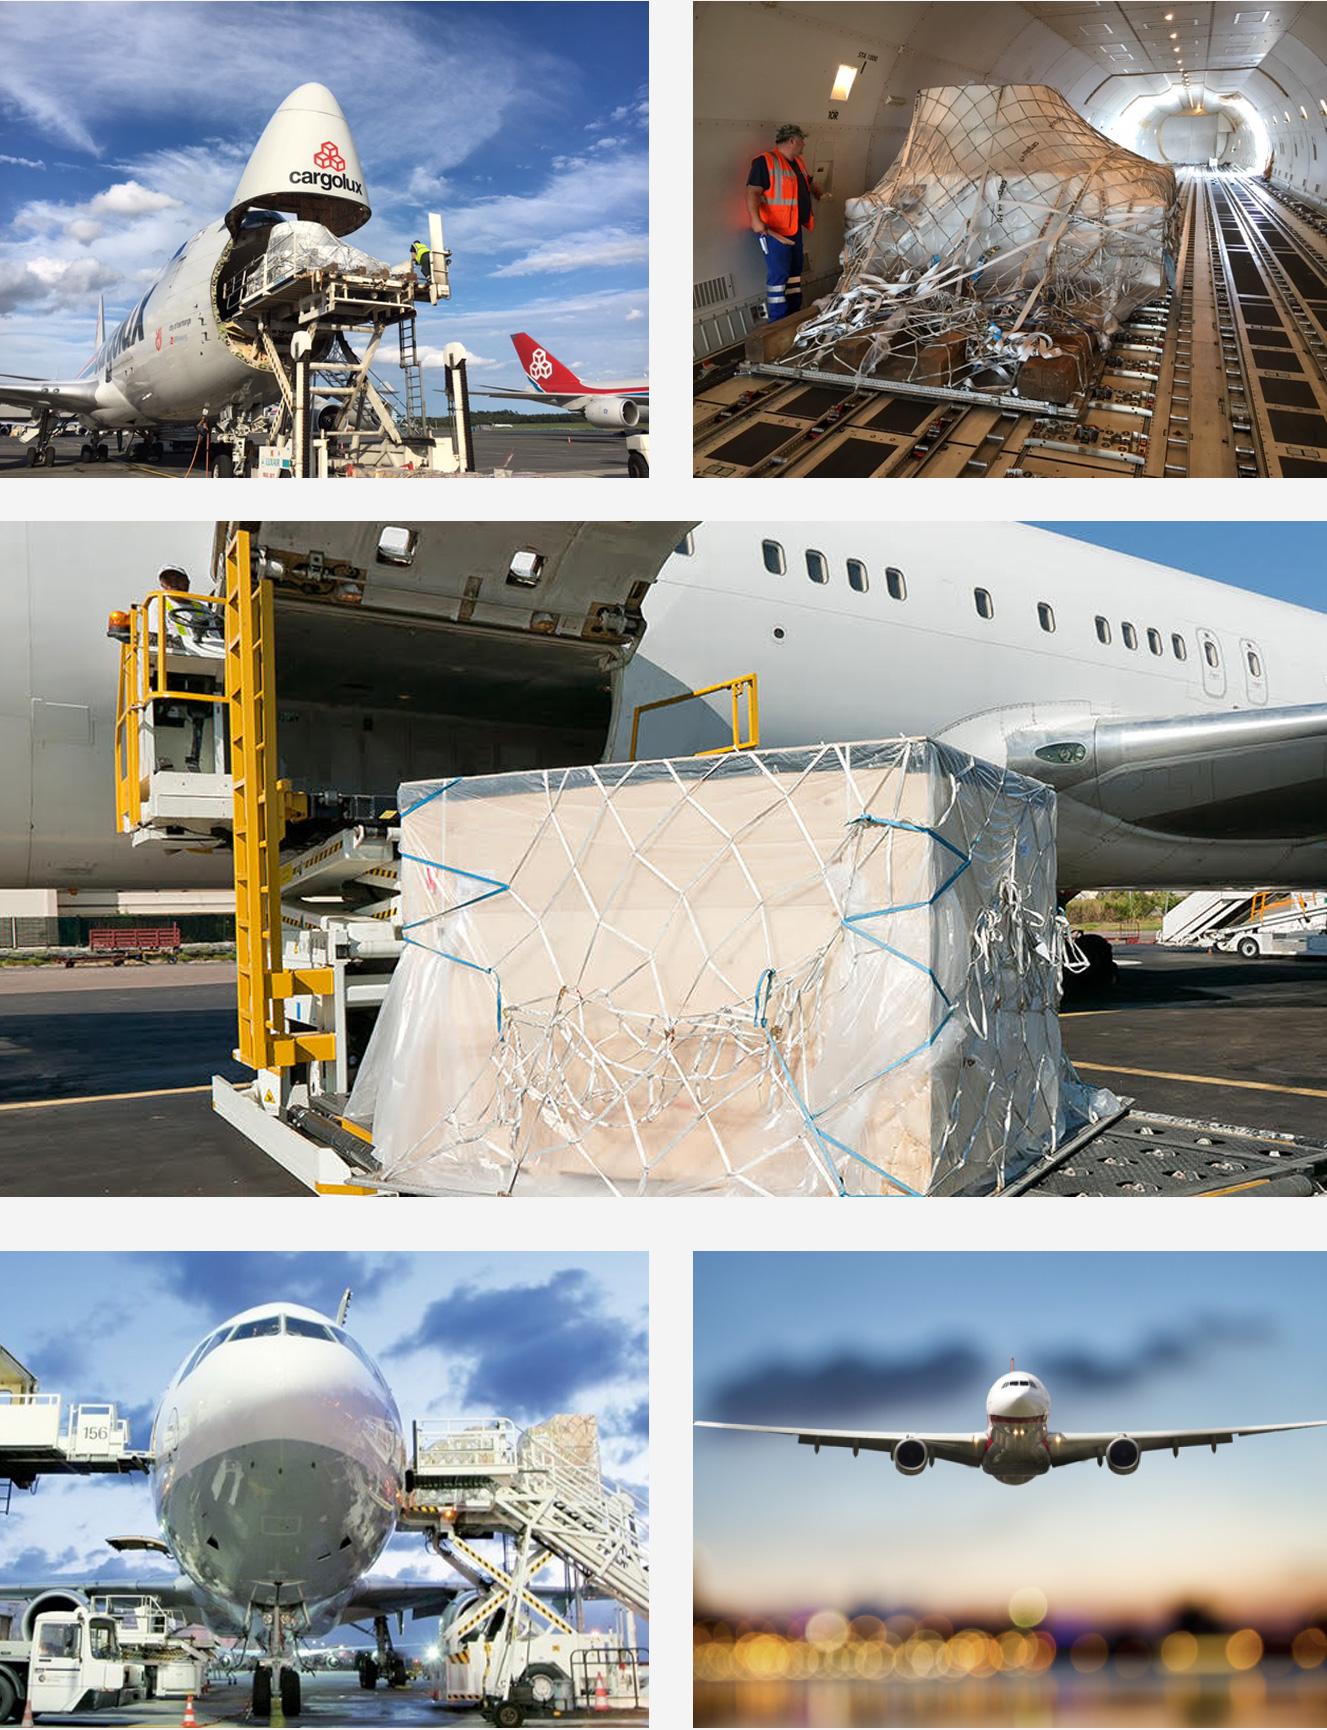 aereo-imagem